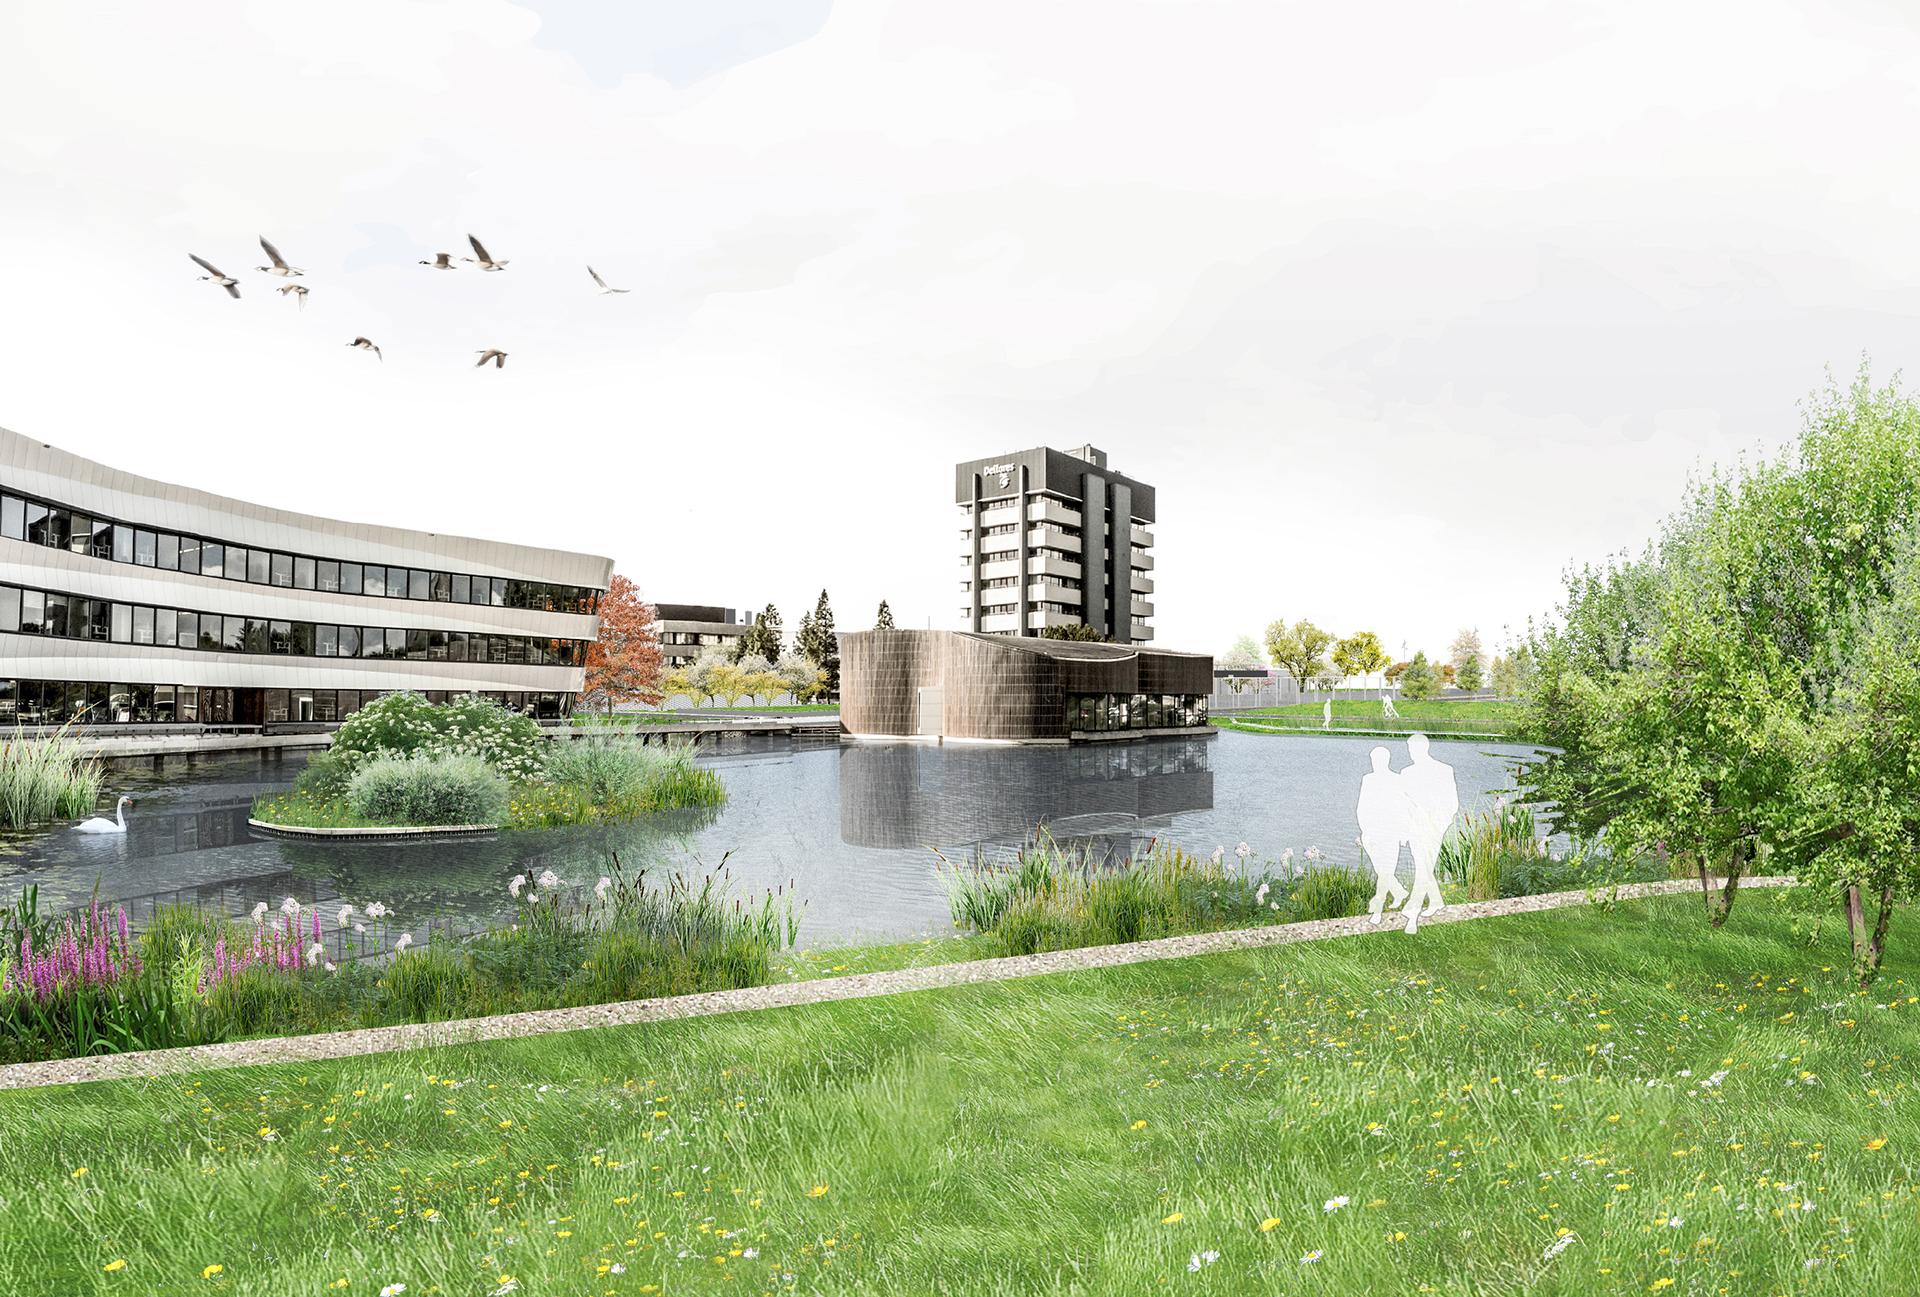 Waterbestendige Campus - Deltares, Delft.